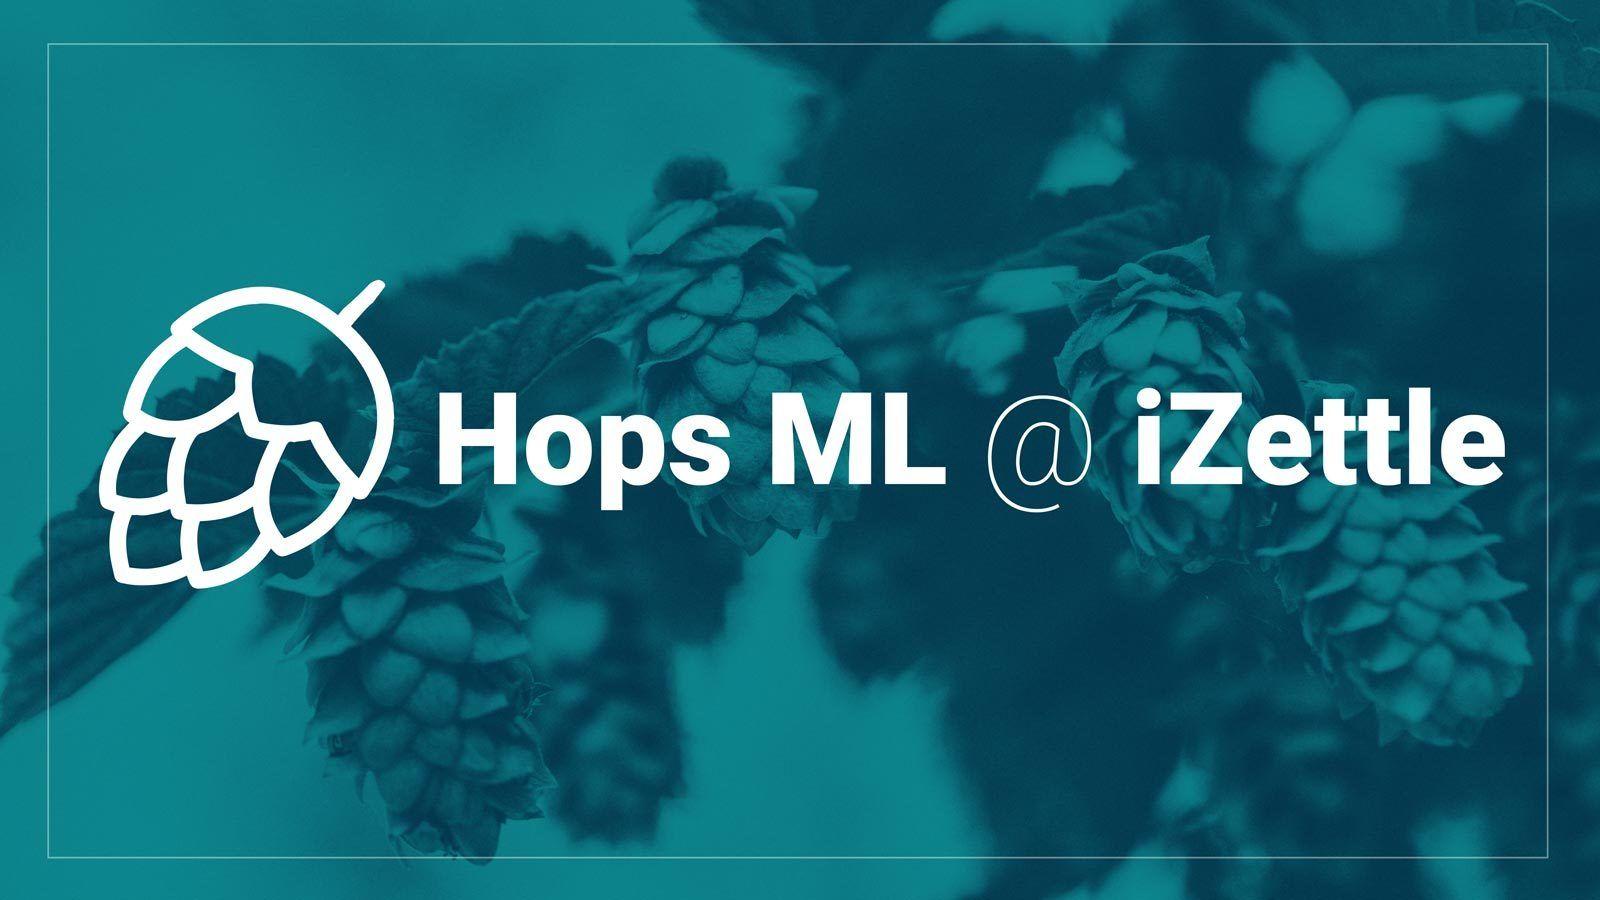 Photos - Hops ML Stockholm (Stockholm) | Meetup